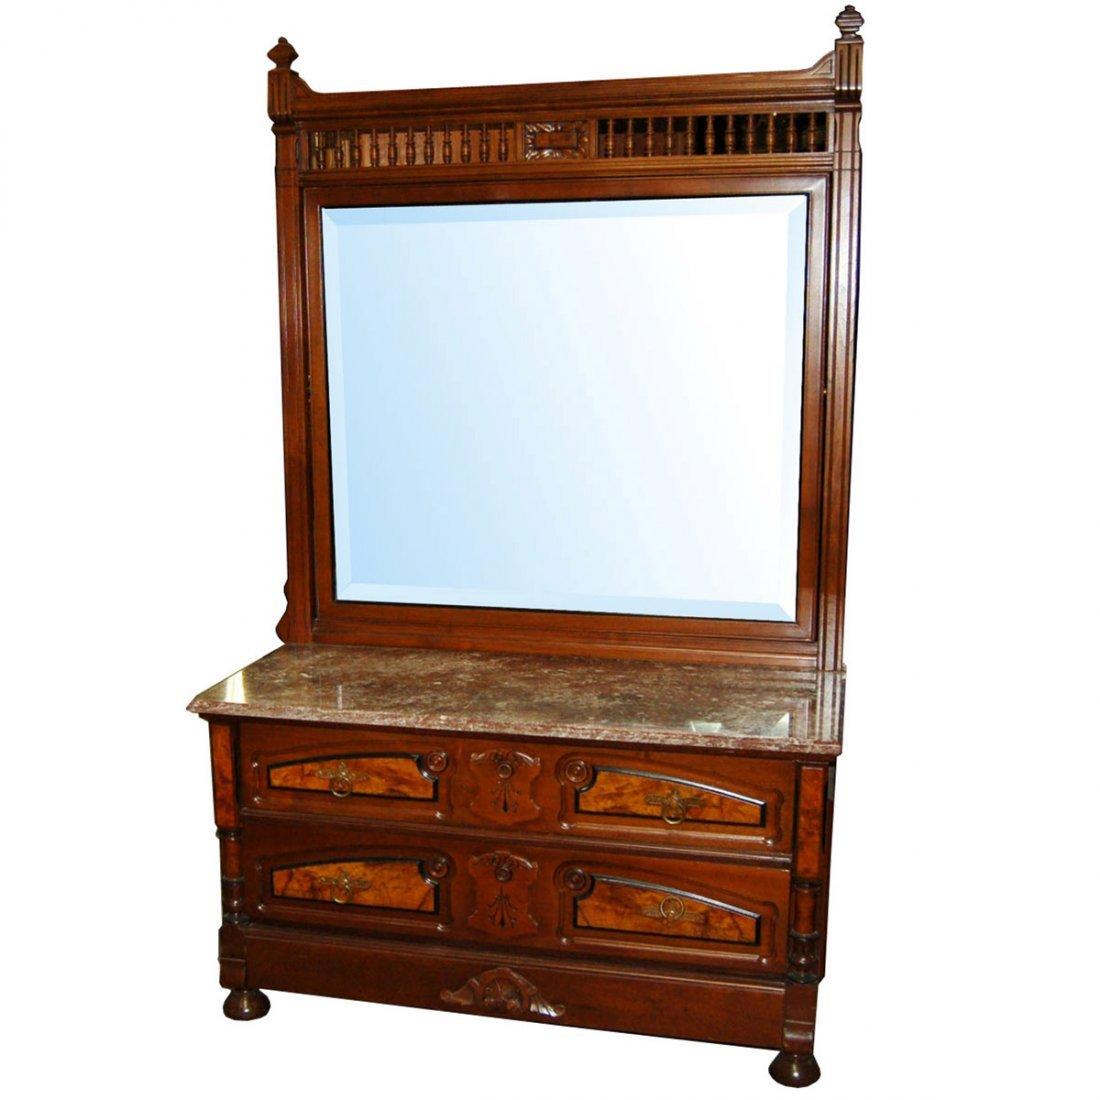 4428 Eastlake Dresser with Marble Top & Beveled Mirror